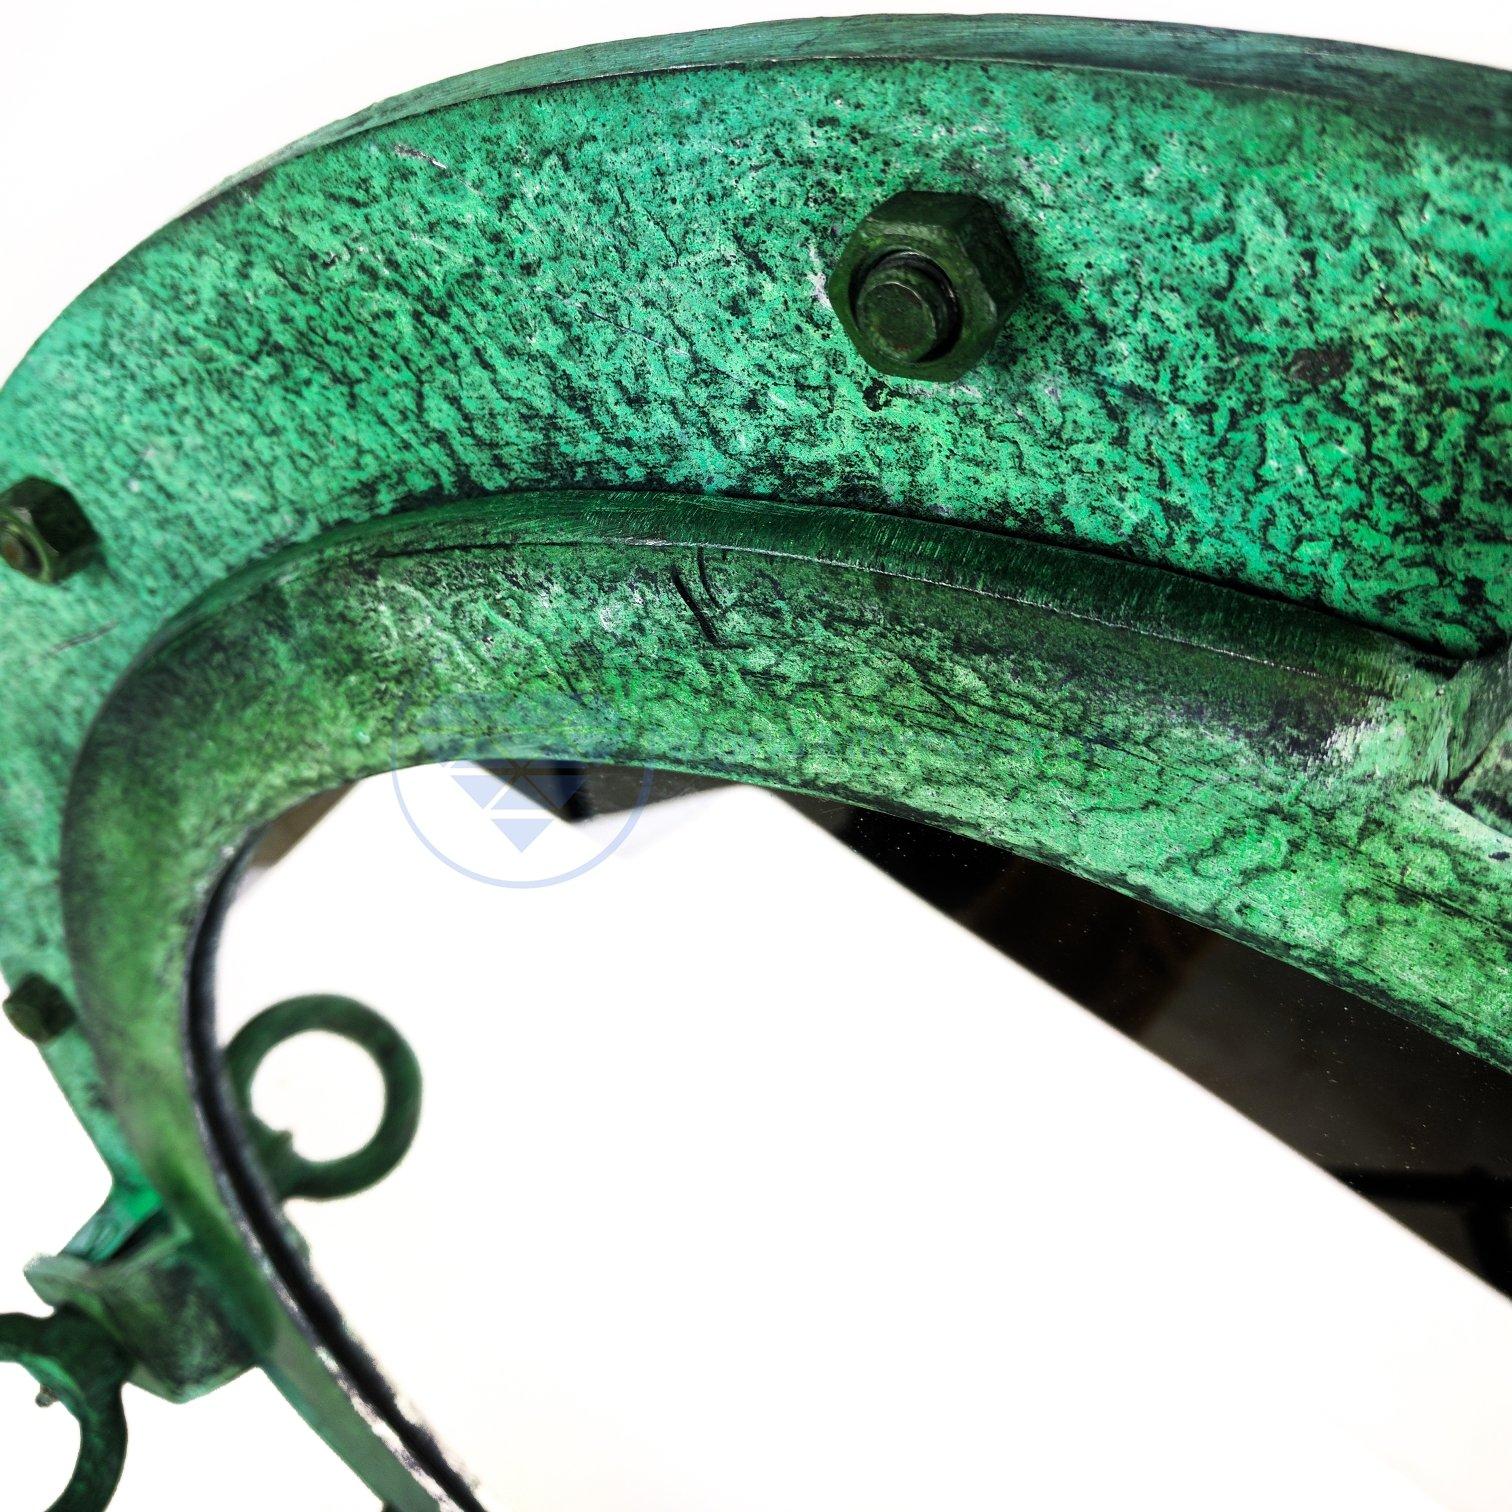 20'' Shipwrecked Premium Aluminum Antique Algae Green Porthole Mirror | Retirement Gift | Nagina International by Nagina International (Image #5)